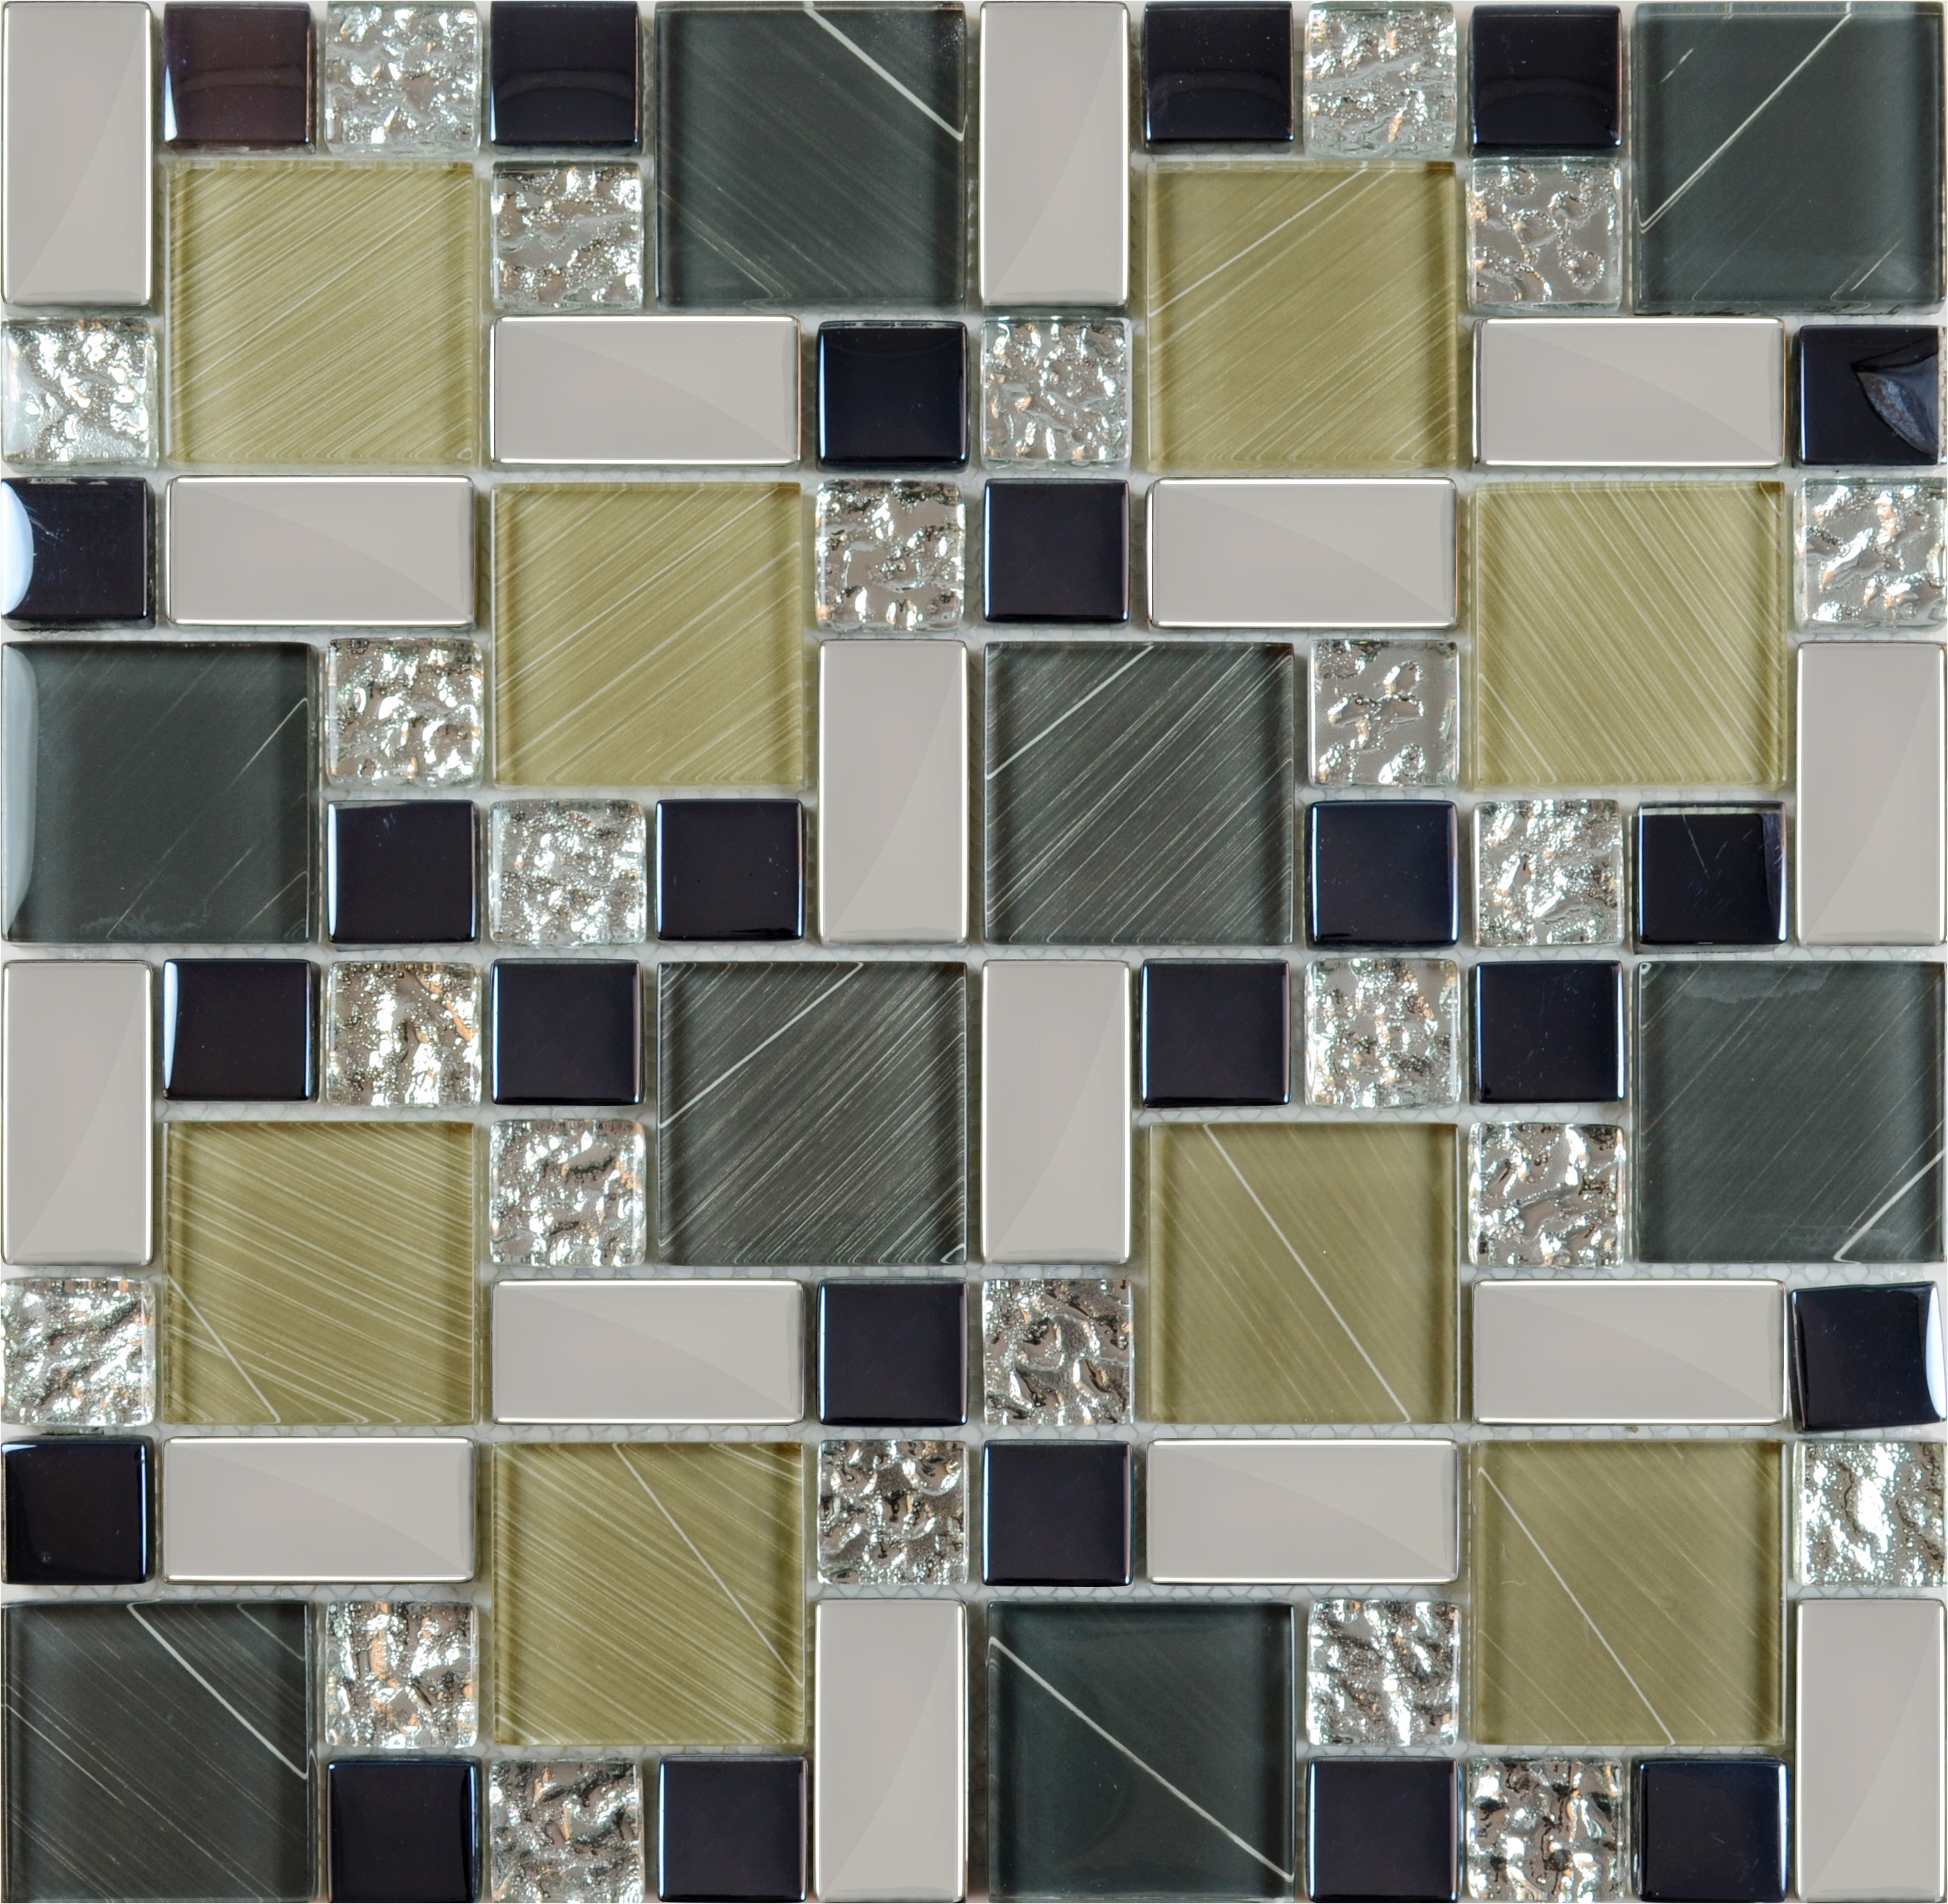 Glass Mosaic Kitchen Wall Tiles